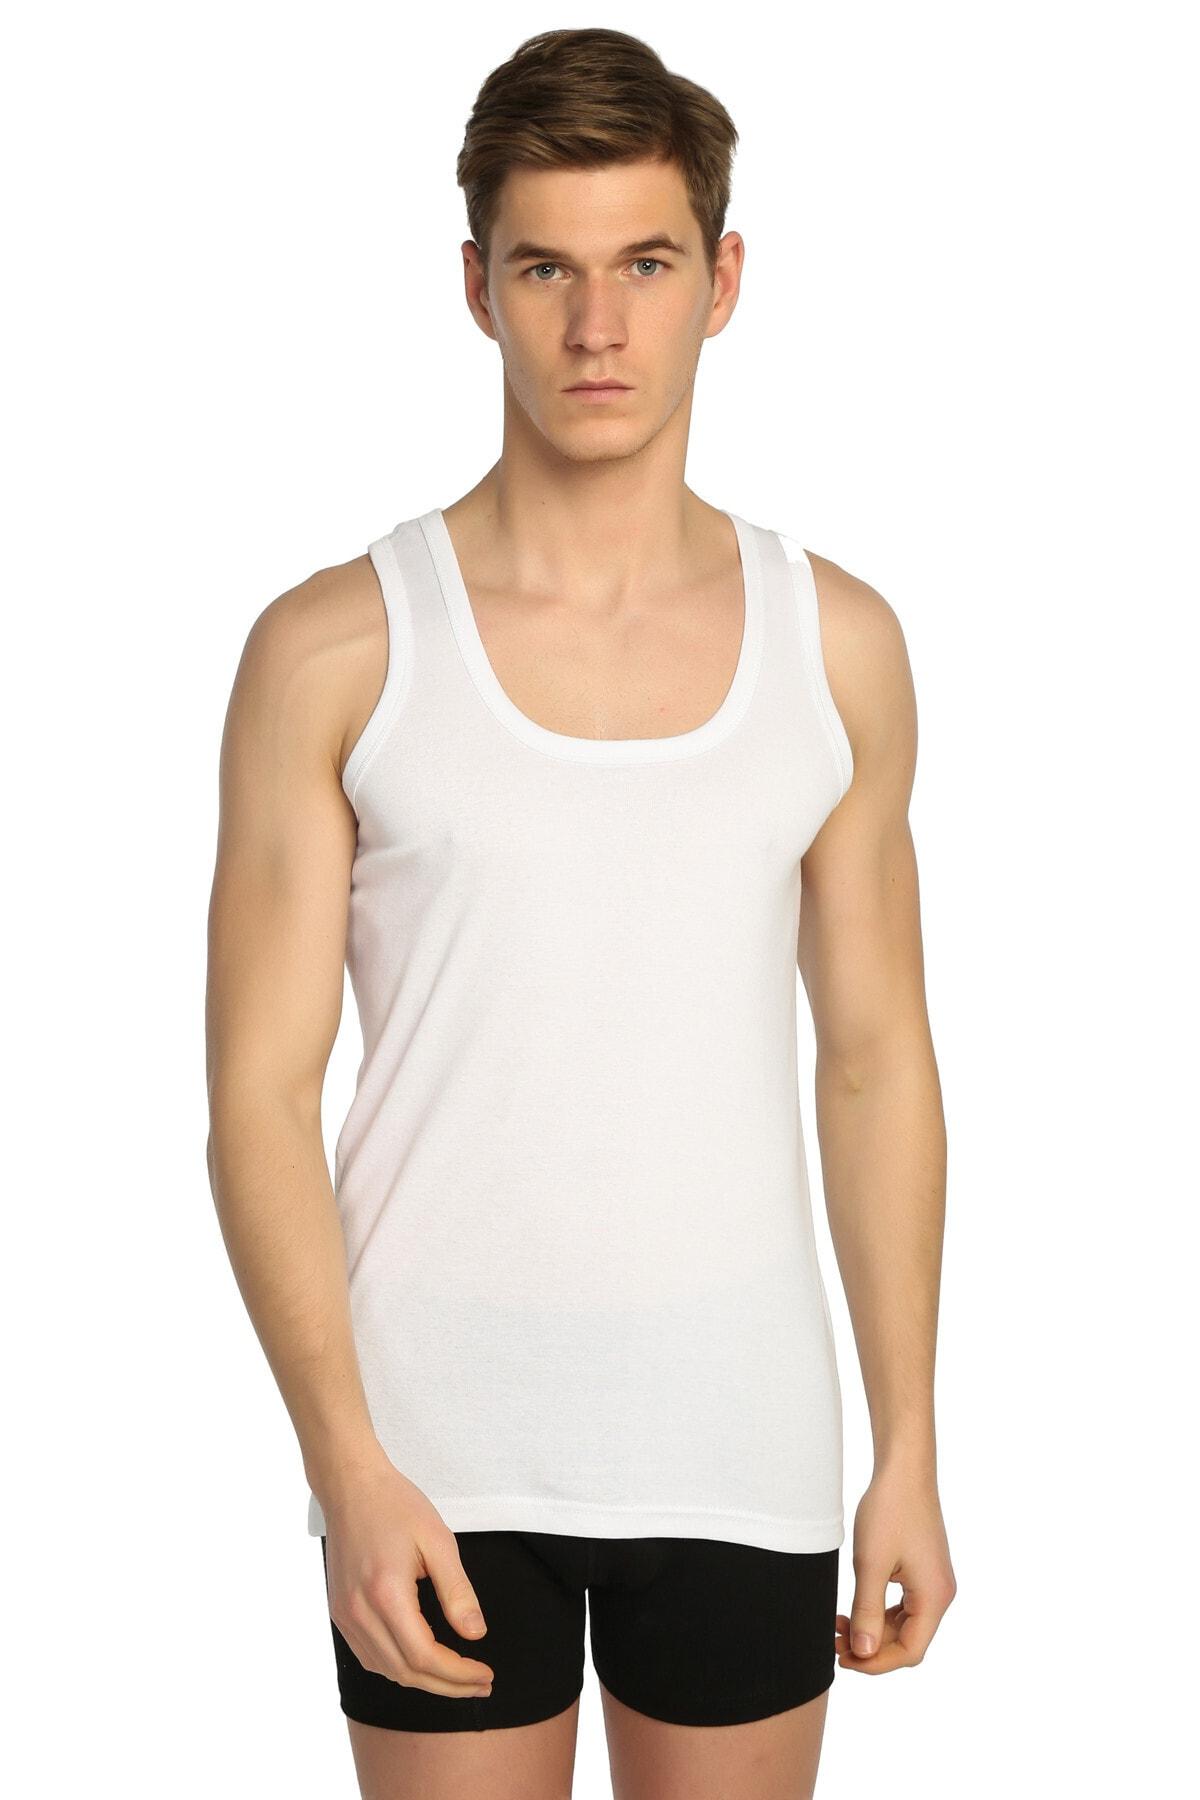 Tutku Erkek Beyaz 6'lı Paket Ribana Klasik Atlet Elf568t0102ccm6 2